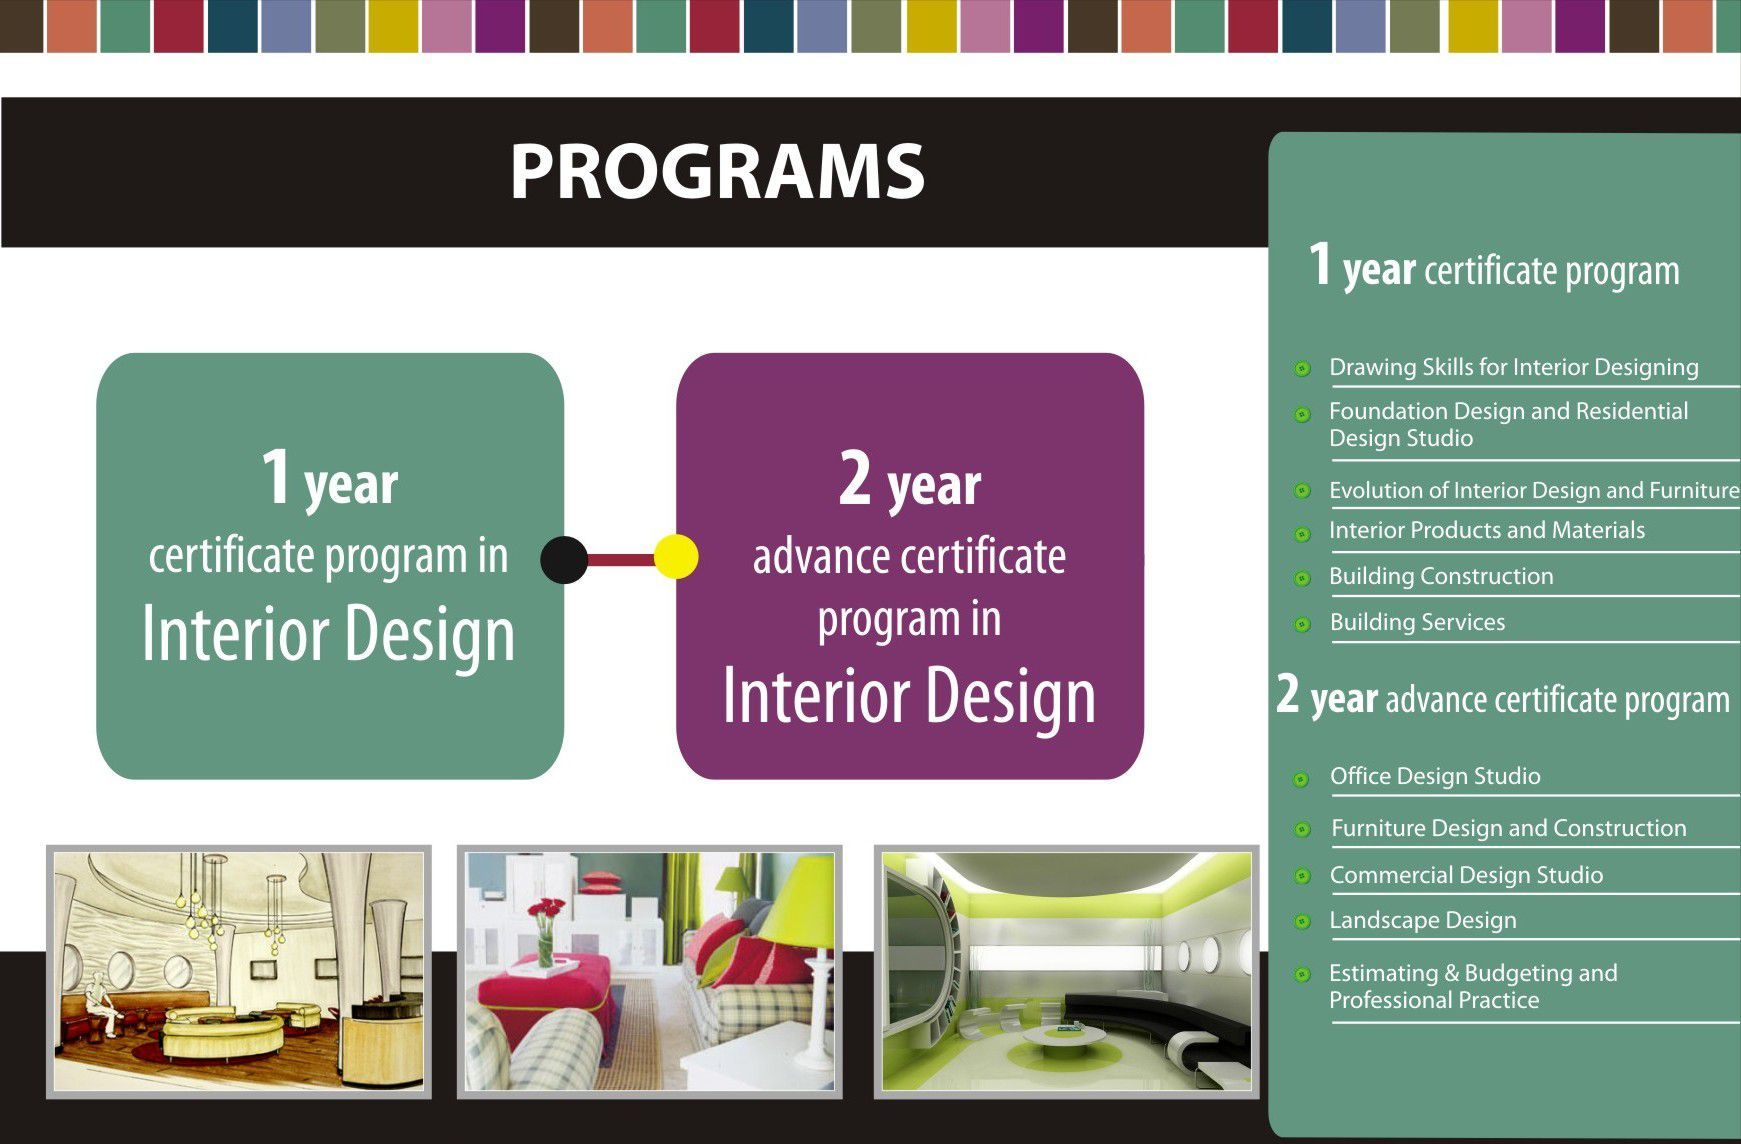 Interior Design Certificate Programs Httpgandum064426